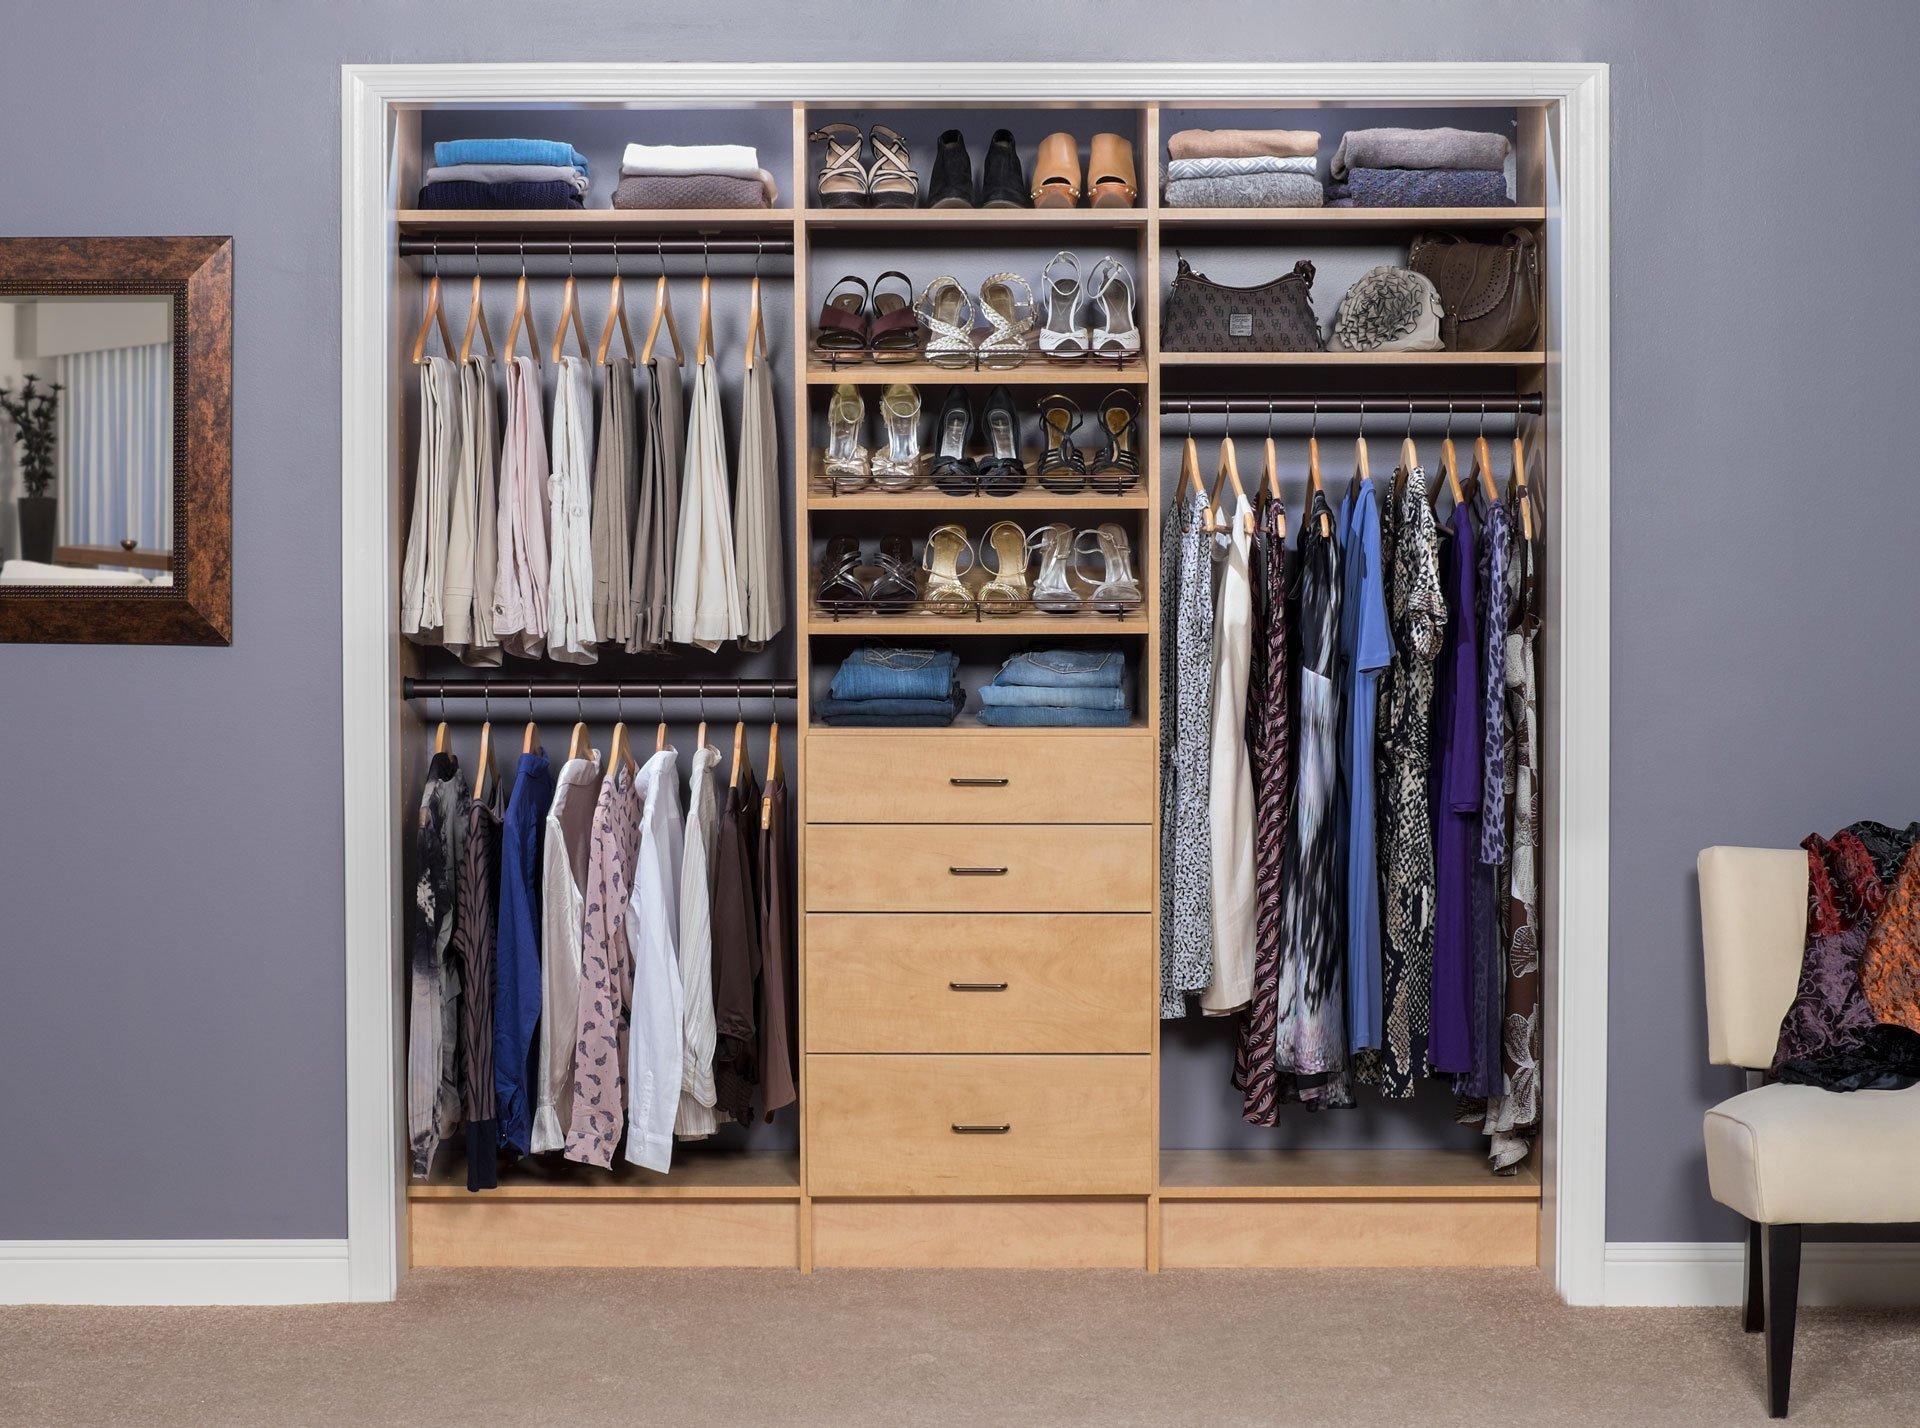 ways life modular blogs improve closet yr organized an your system can themodule